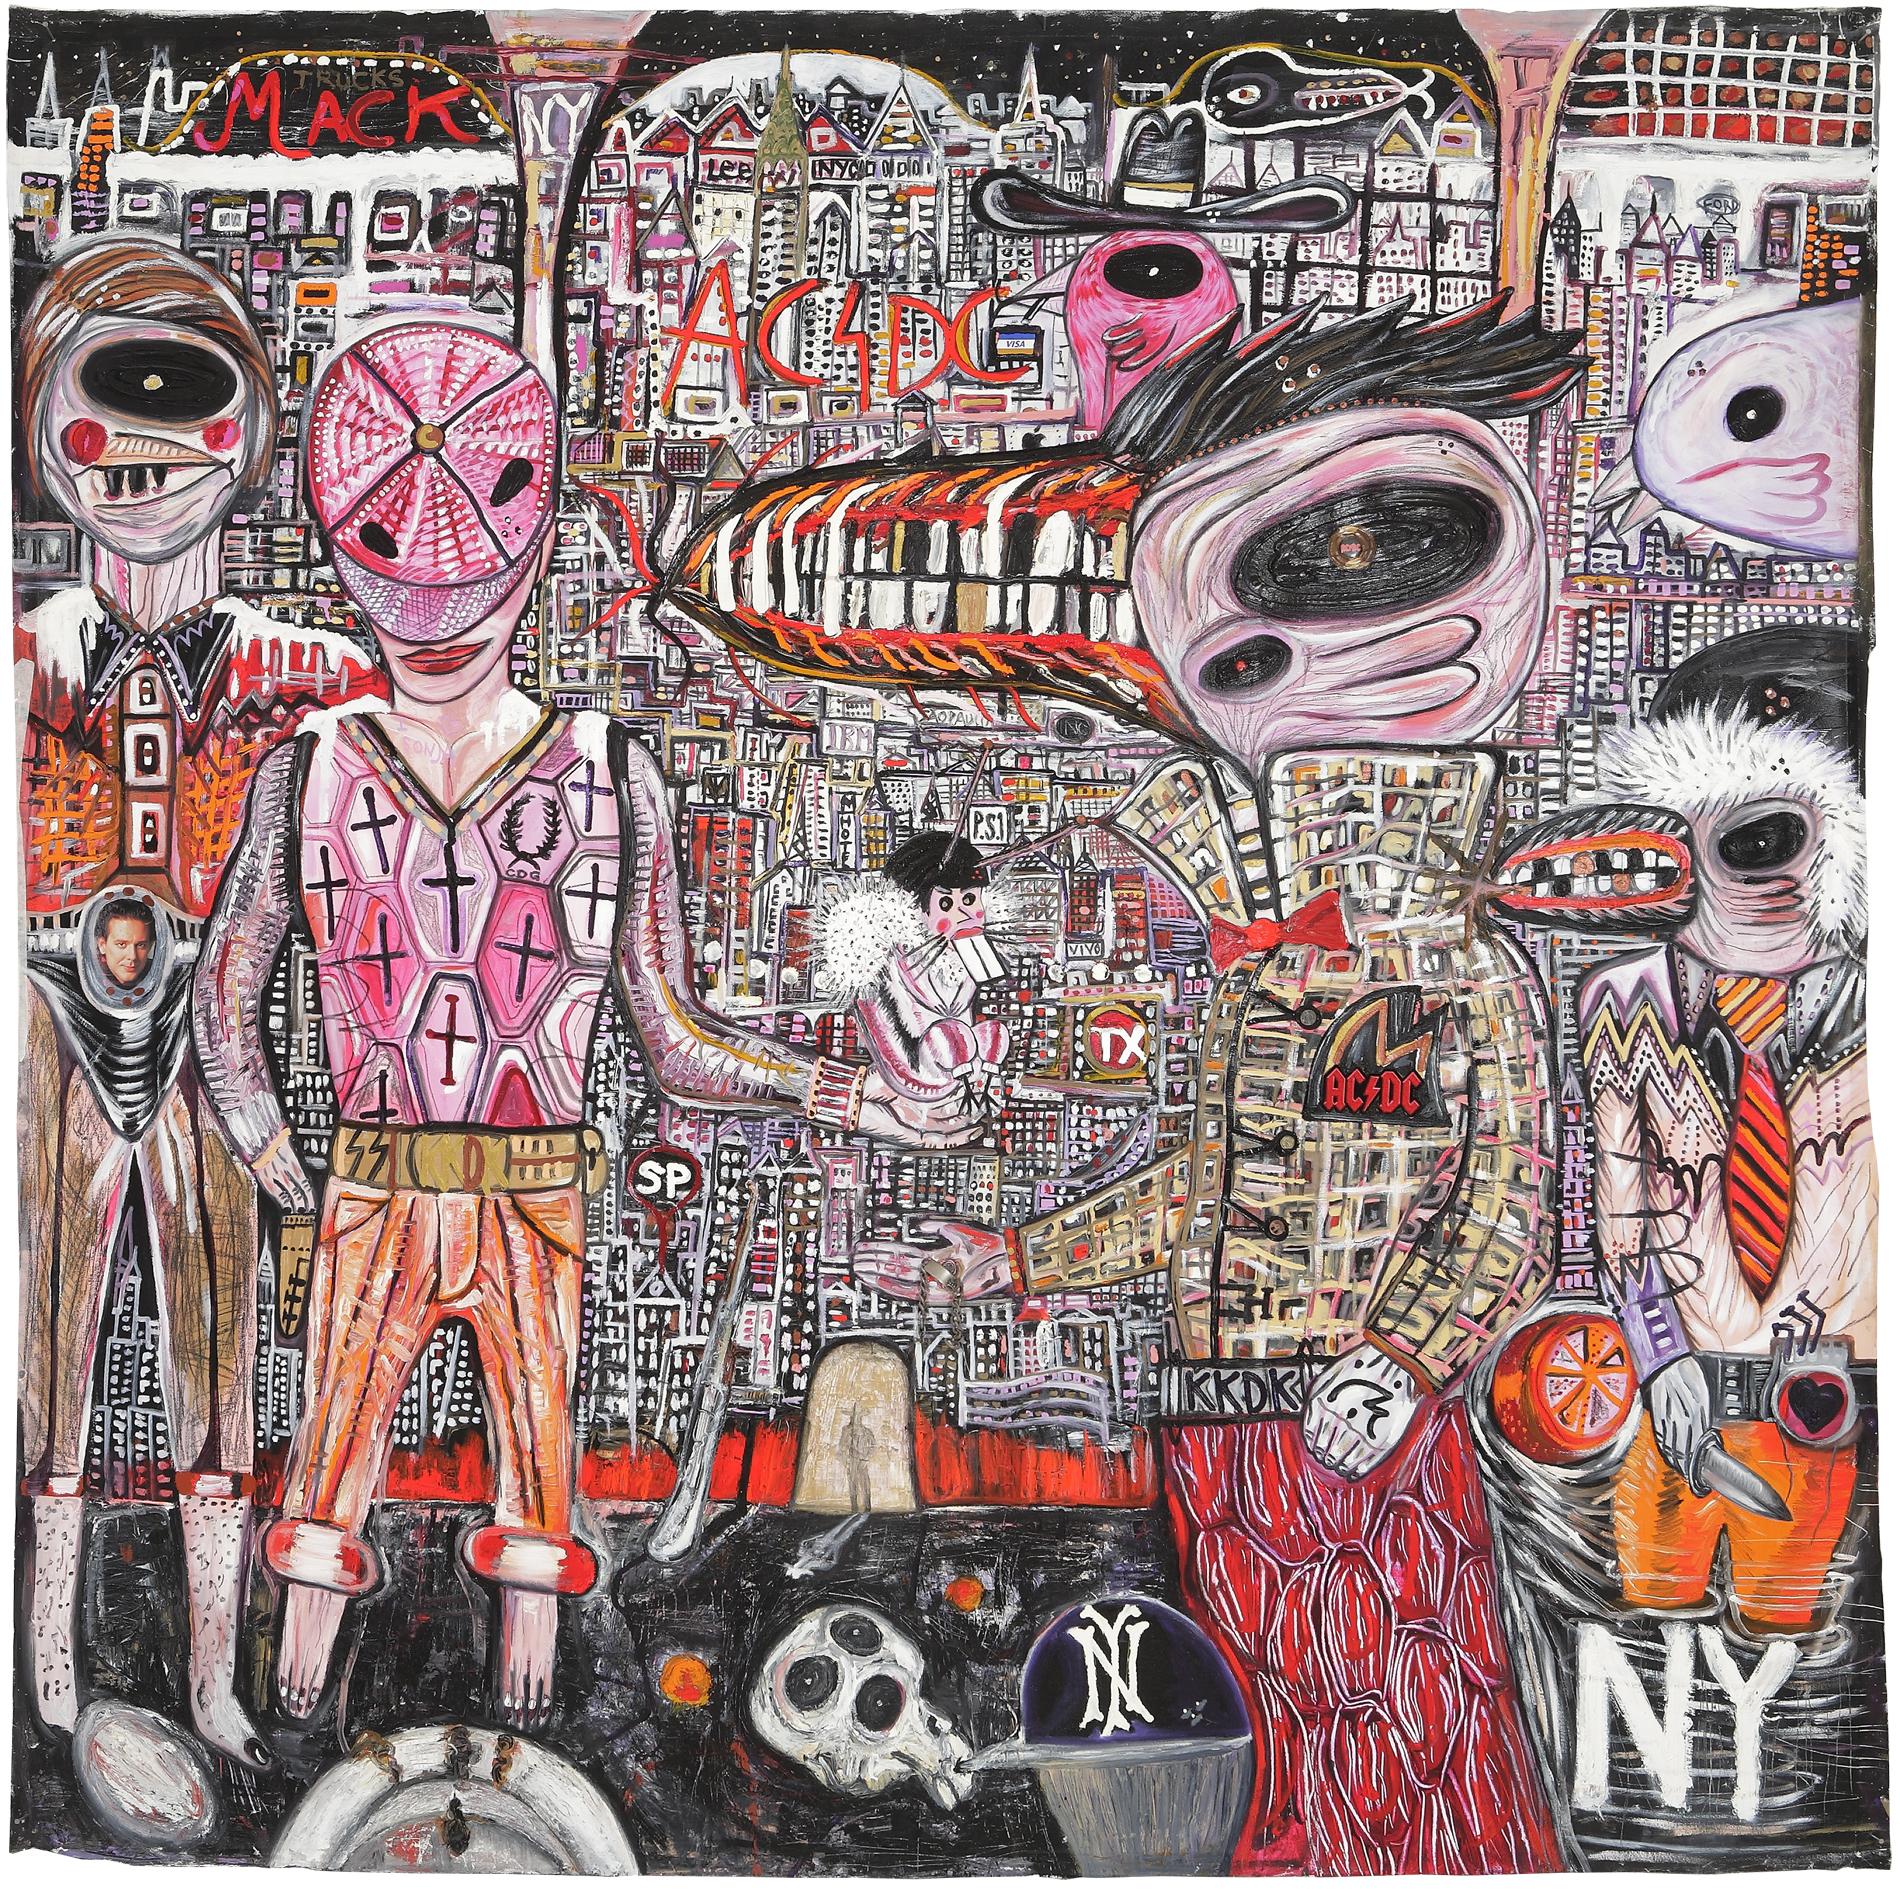 Abdul Vas. Rock ´N´ Roll. New York, NY, 2005